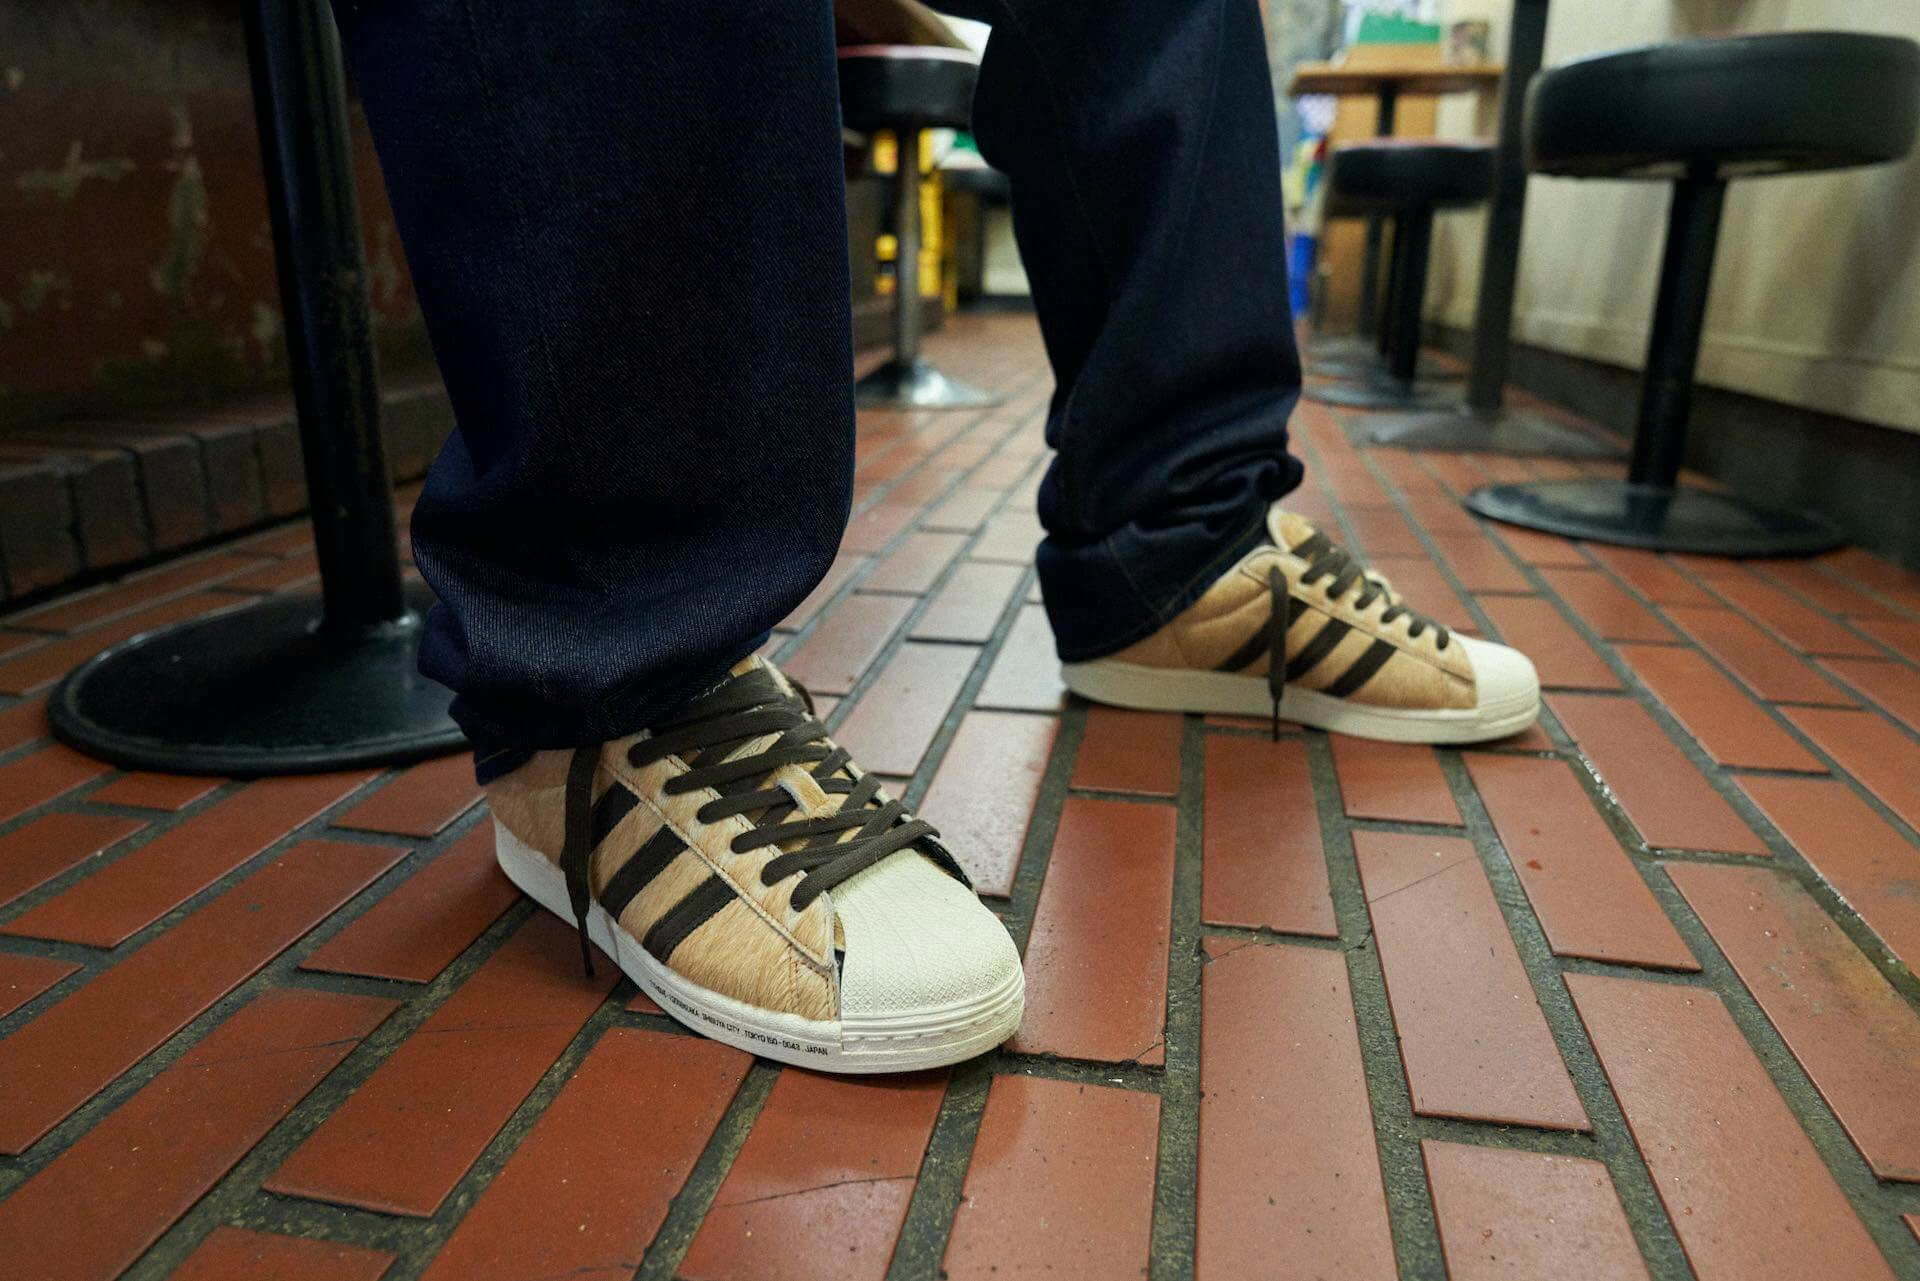 atmosとadidas Originalsがコラボ!渋谷のアイコンであるハチ公をモチーフにしたスニーカーが登場 life210913_adidas_shibuya_5